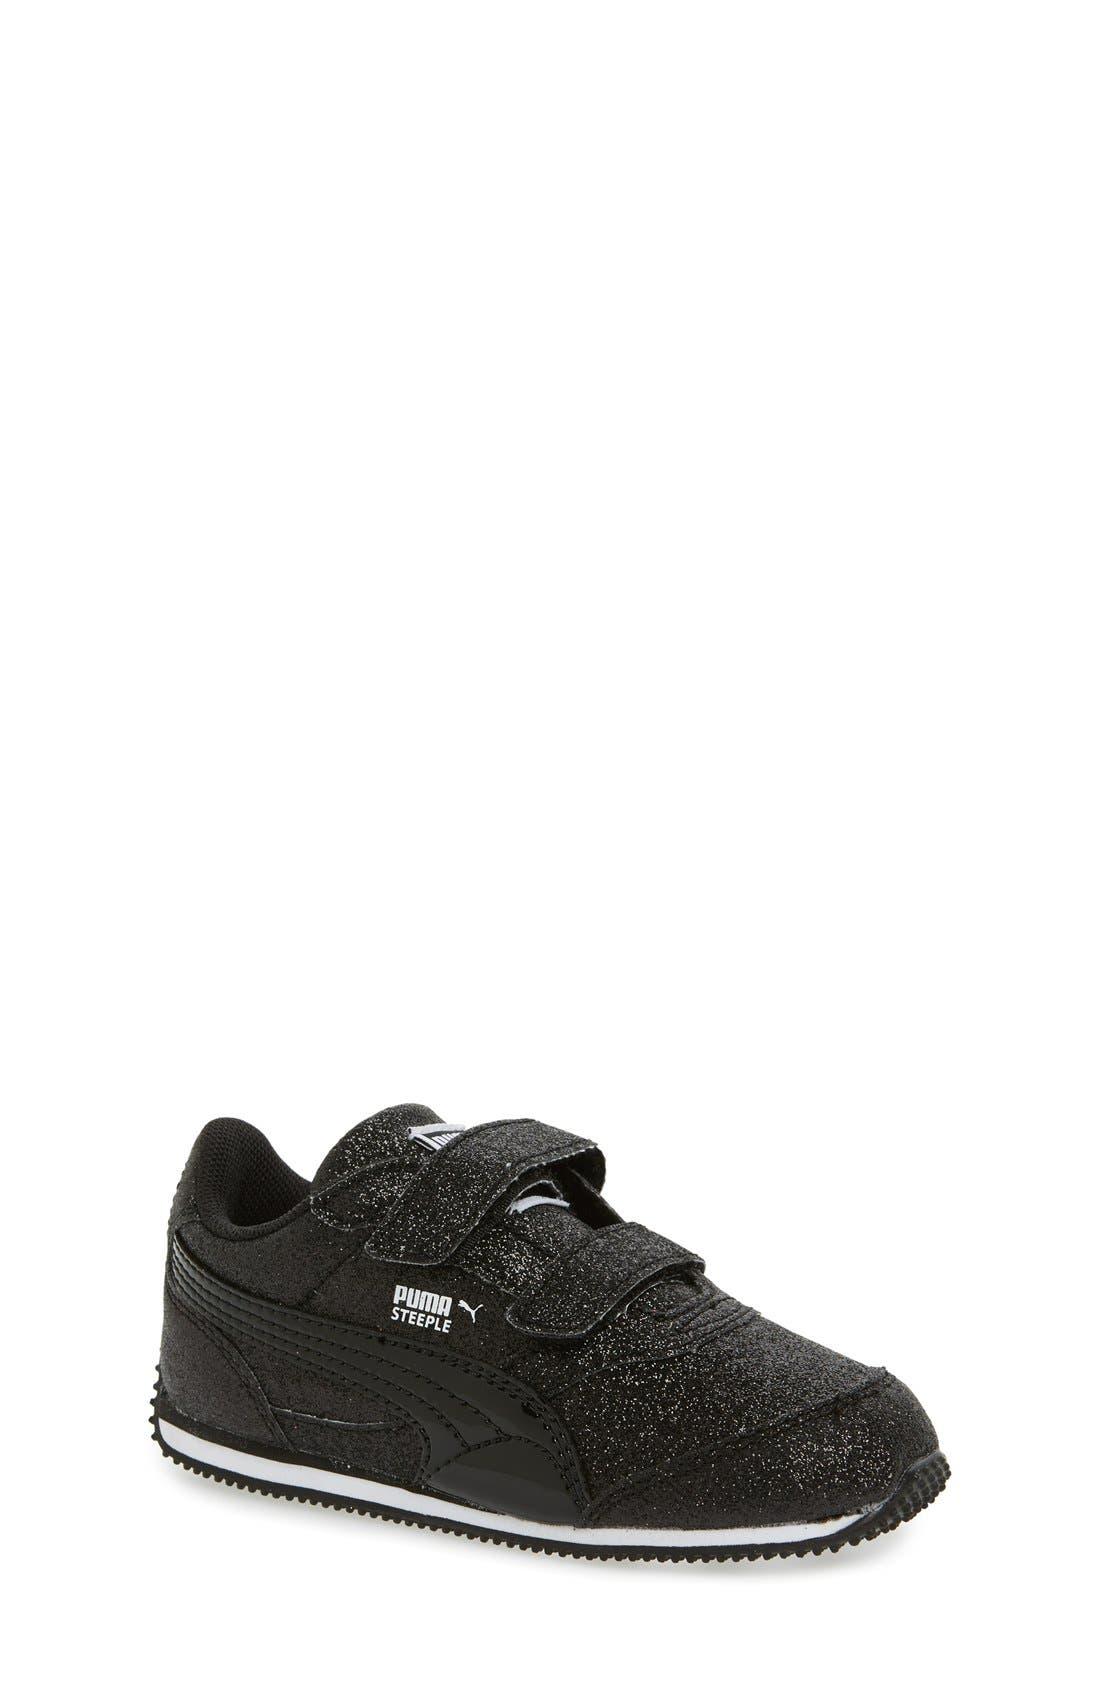 'Steeple Glitz' Sneaker,                             Main thumbnail 1, color,                             001